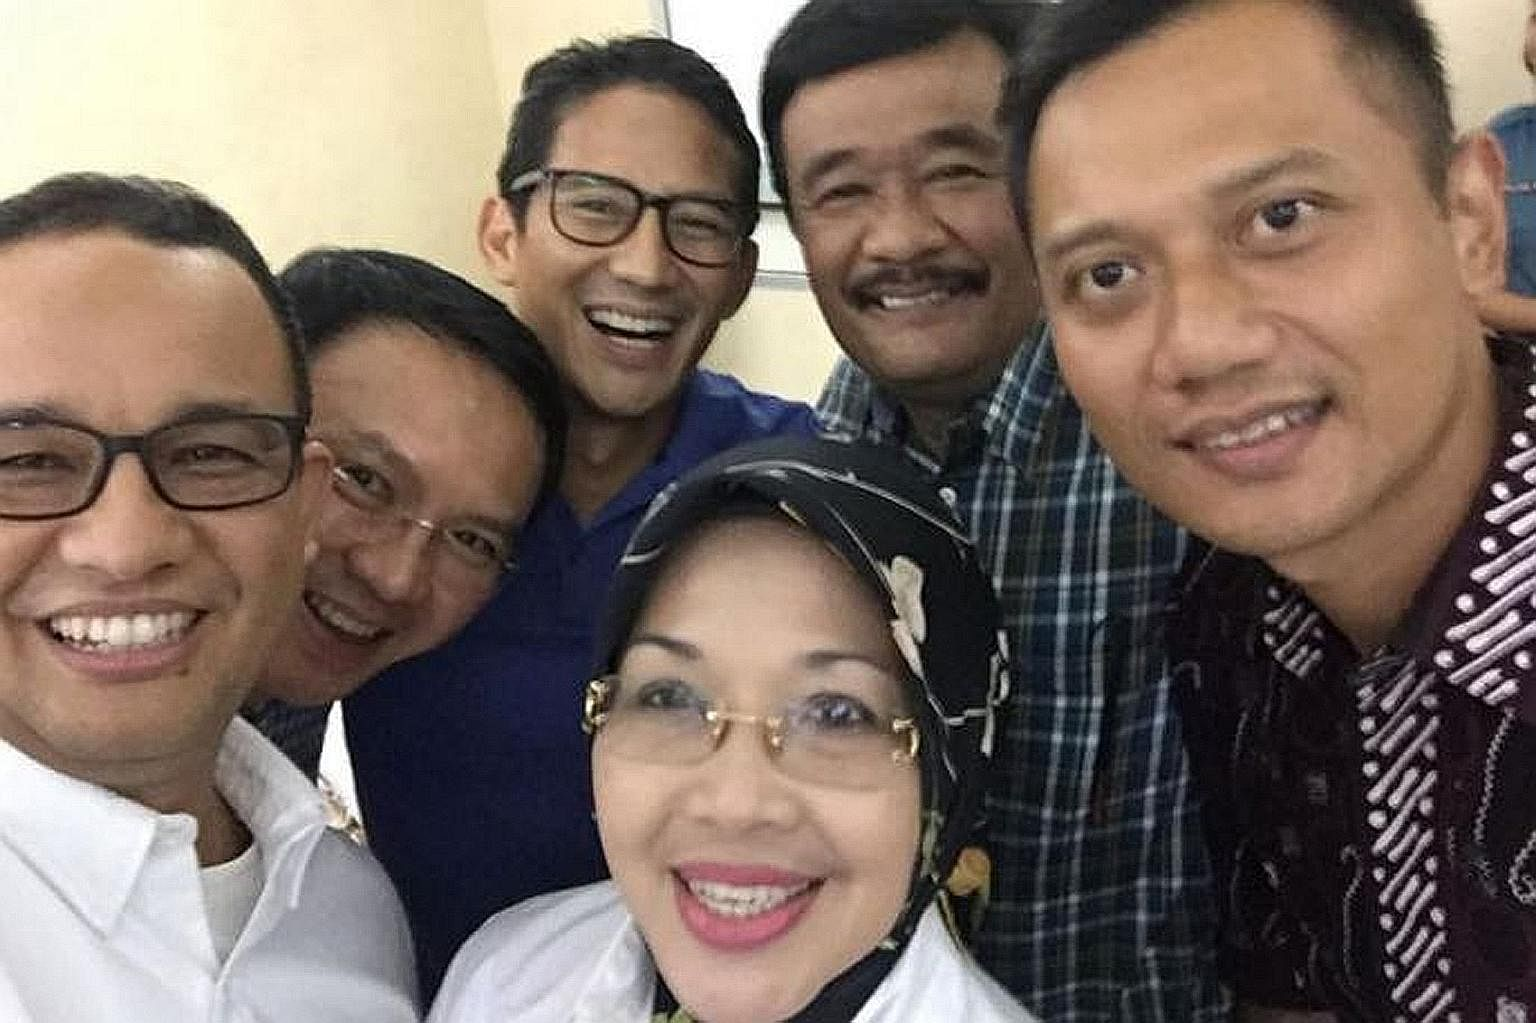 (from left) Dr Anies Baswedan, Mr Basuki Tjahaja Purnama, Mr Sandiaga Uno, Dr Sylviana Murni, Mr Djarot Saiful Hidayat and Mr Agus Harimurti Yudhoyono.